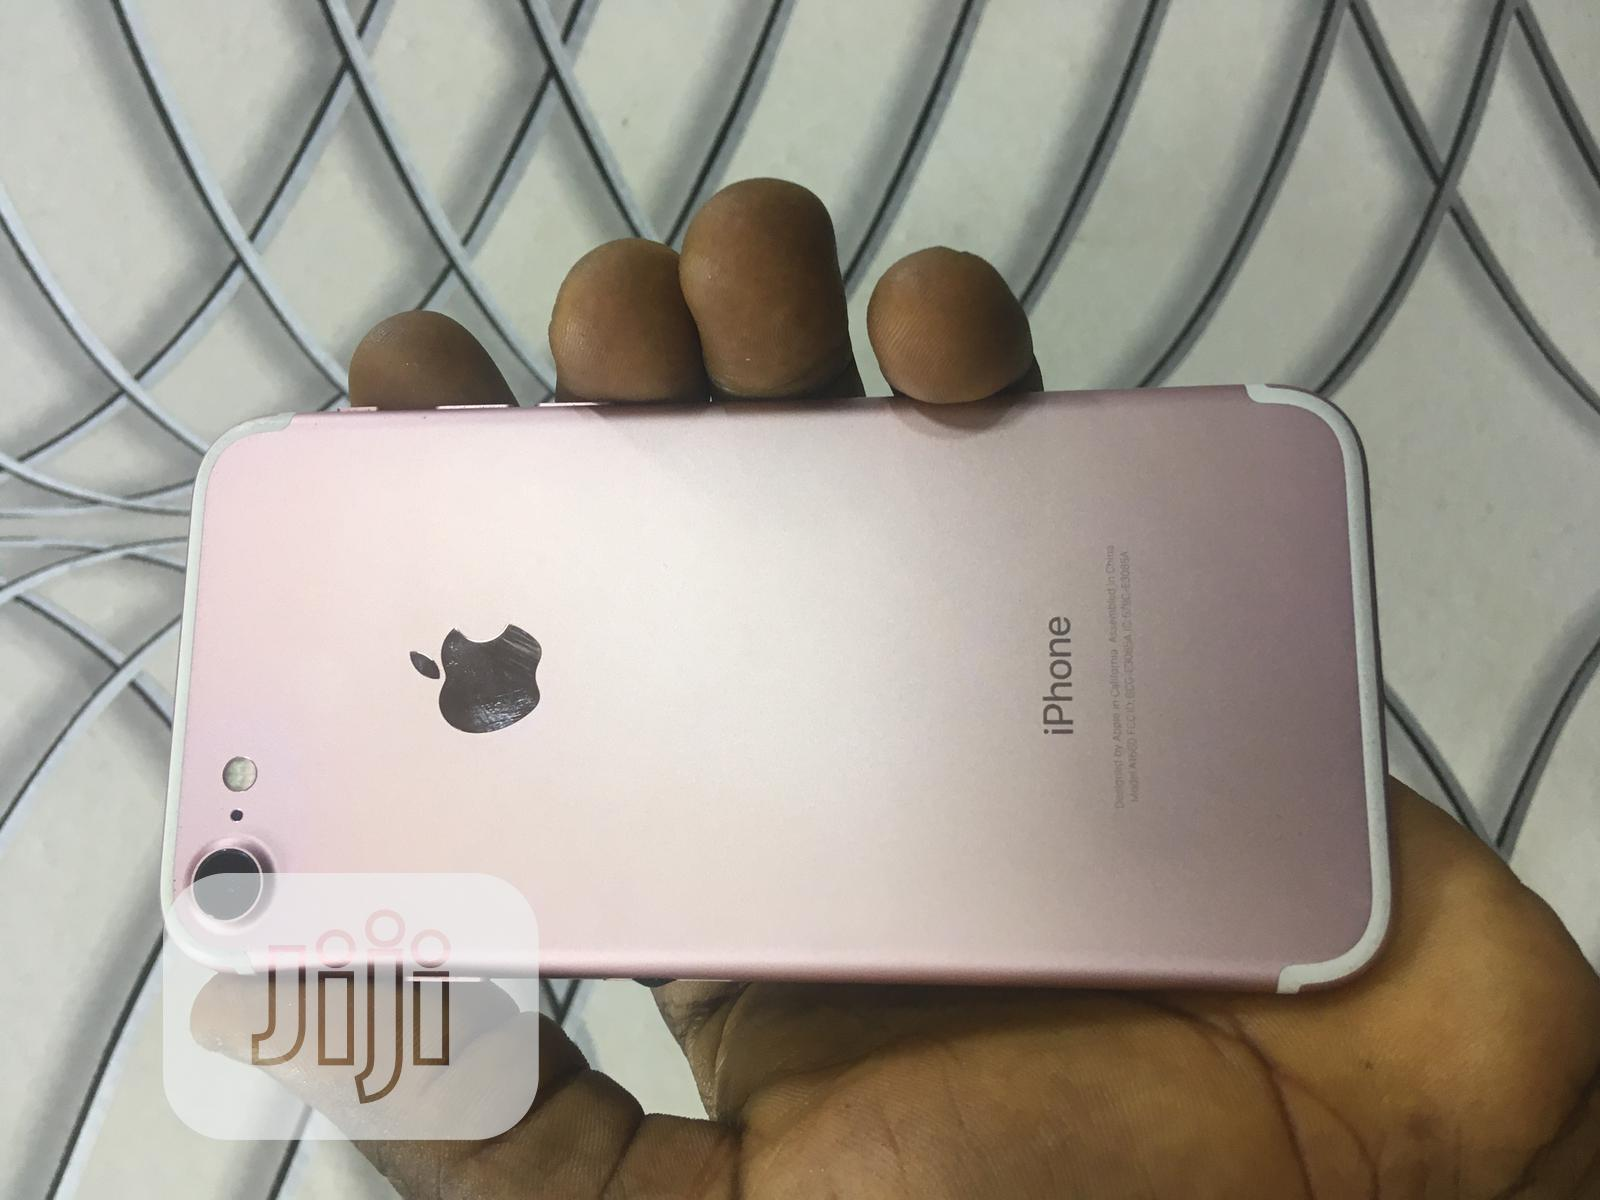 Apple iPhone 7 32 GB Gray | Mobile Phones for sale in Ikeja, Lagos State, Nigeria